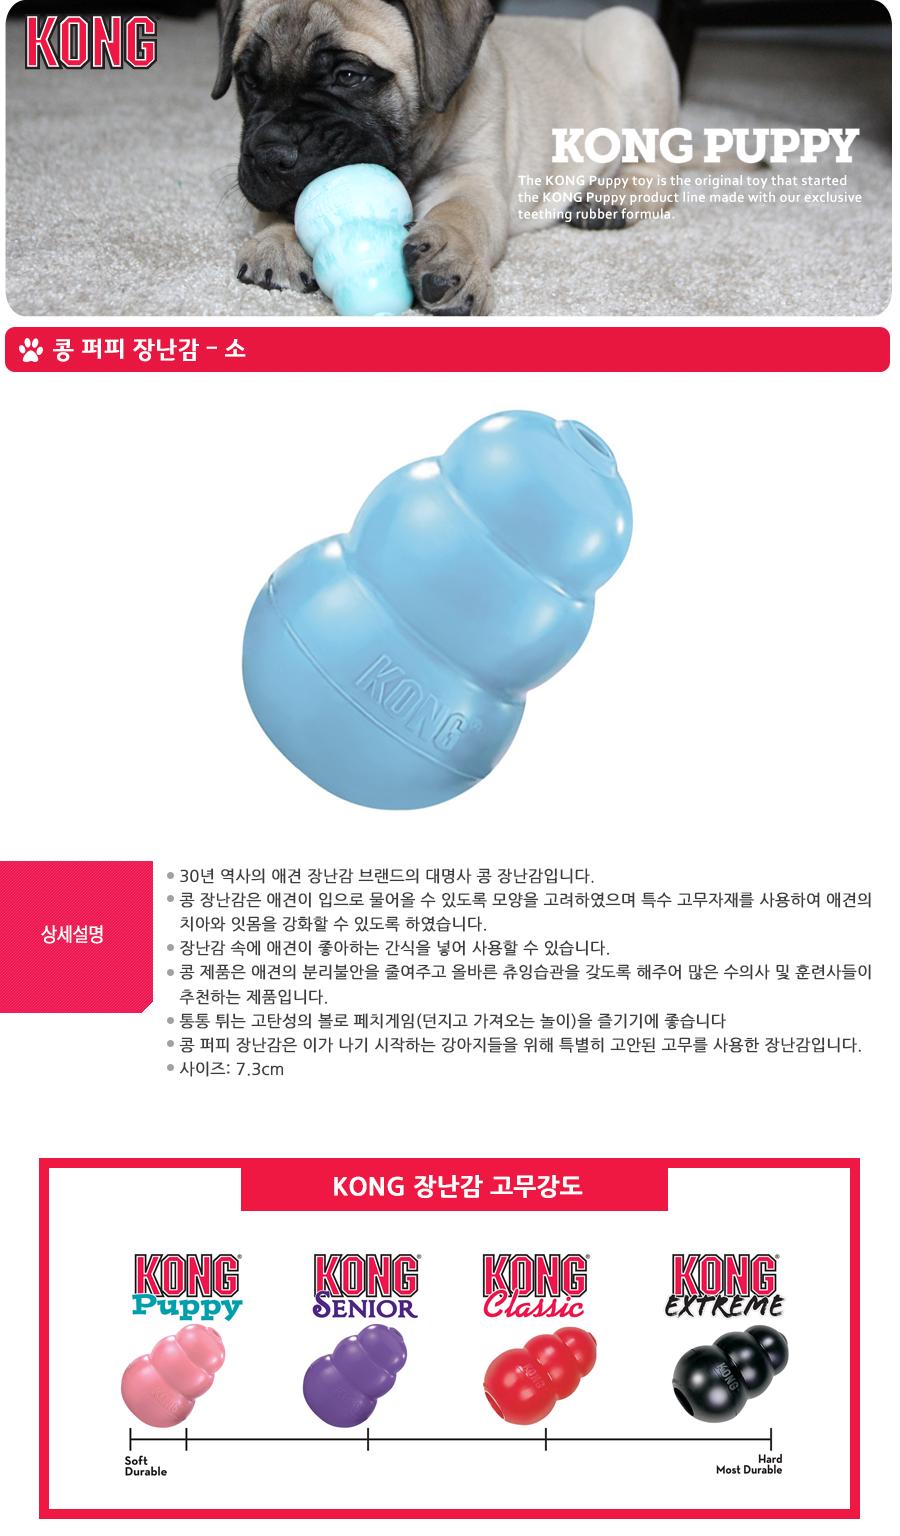 KONG 콩장난감 퍼피 (소)-상품이미지-0